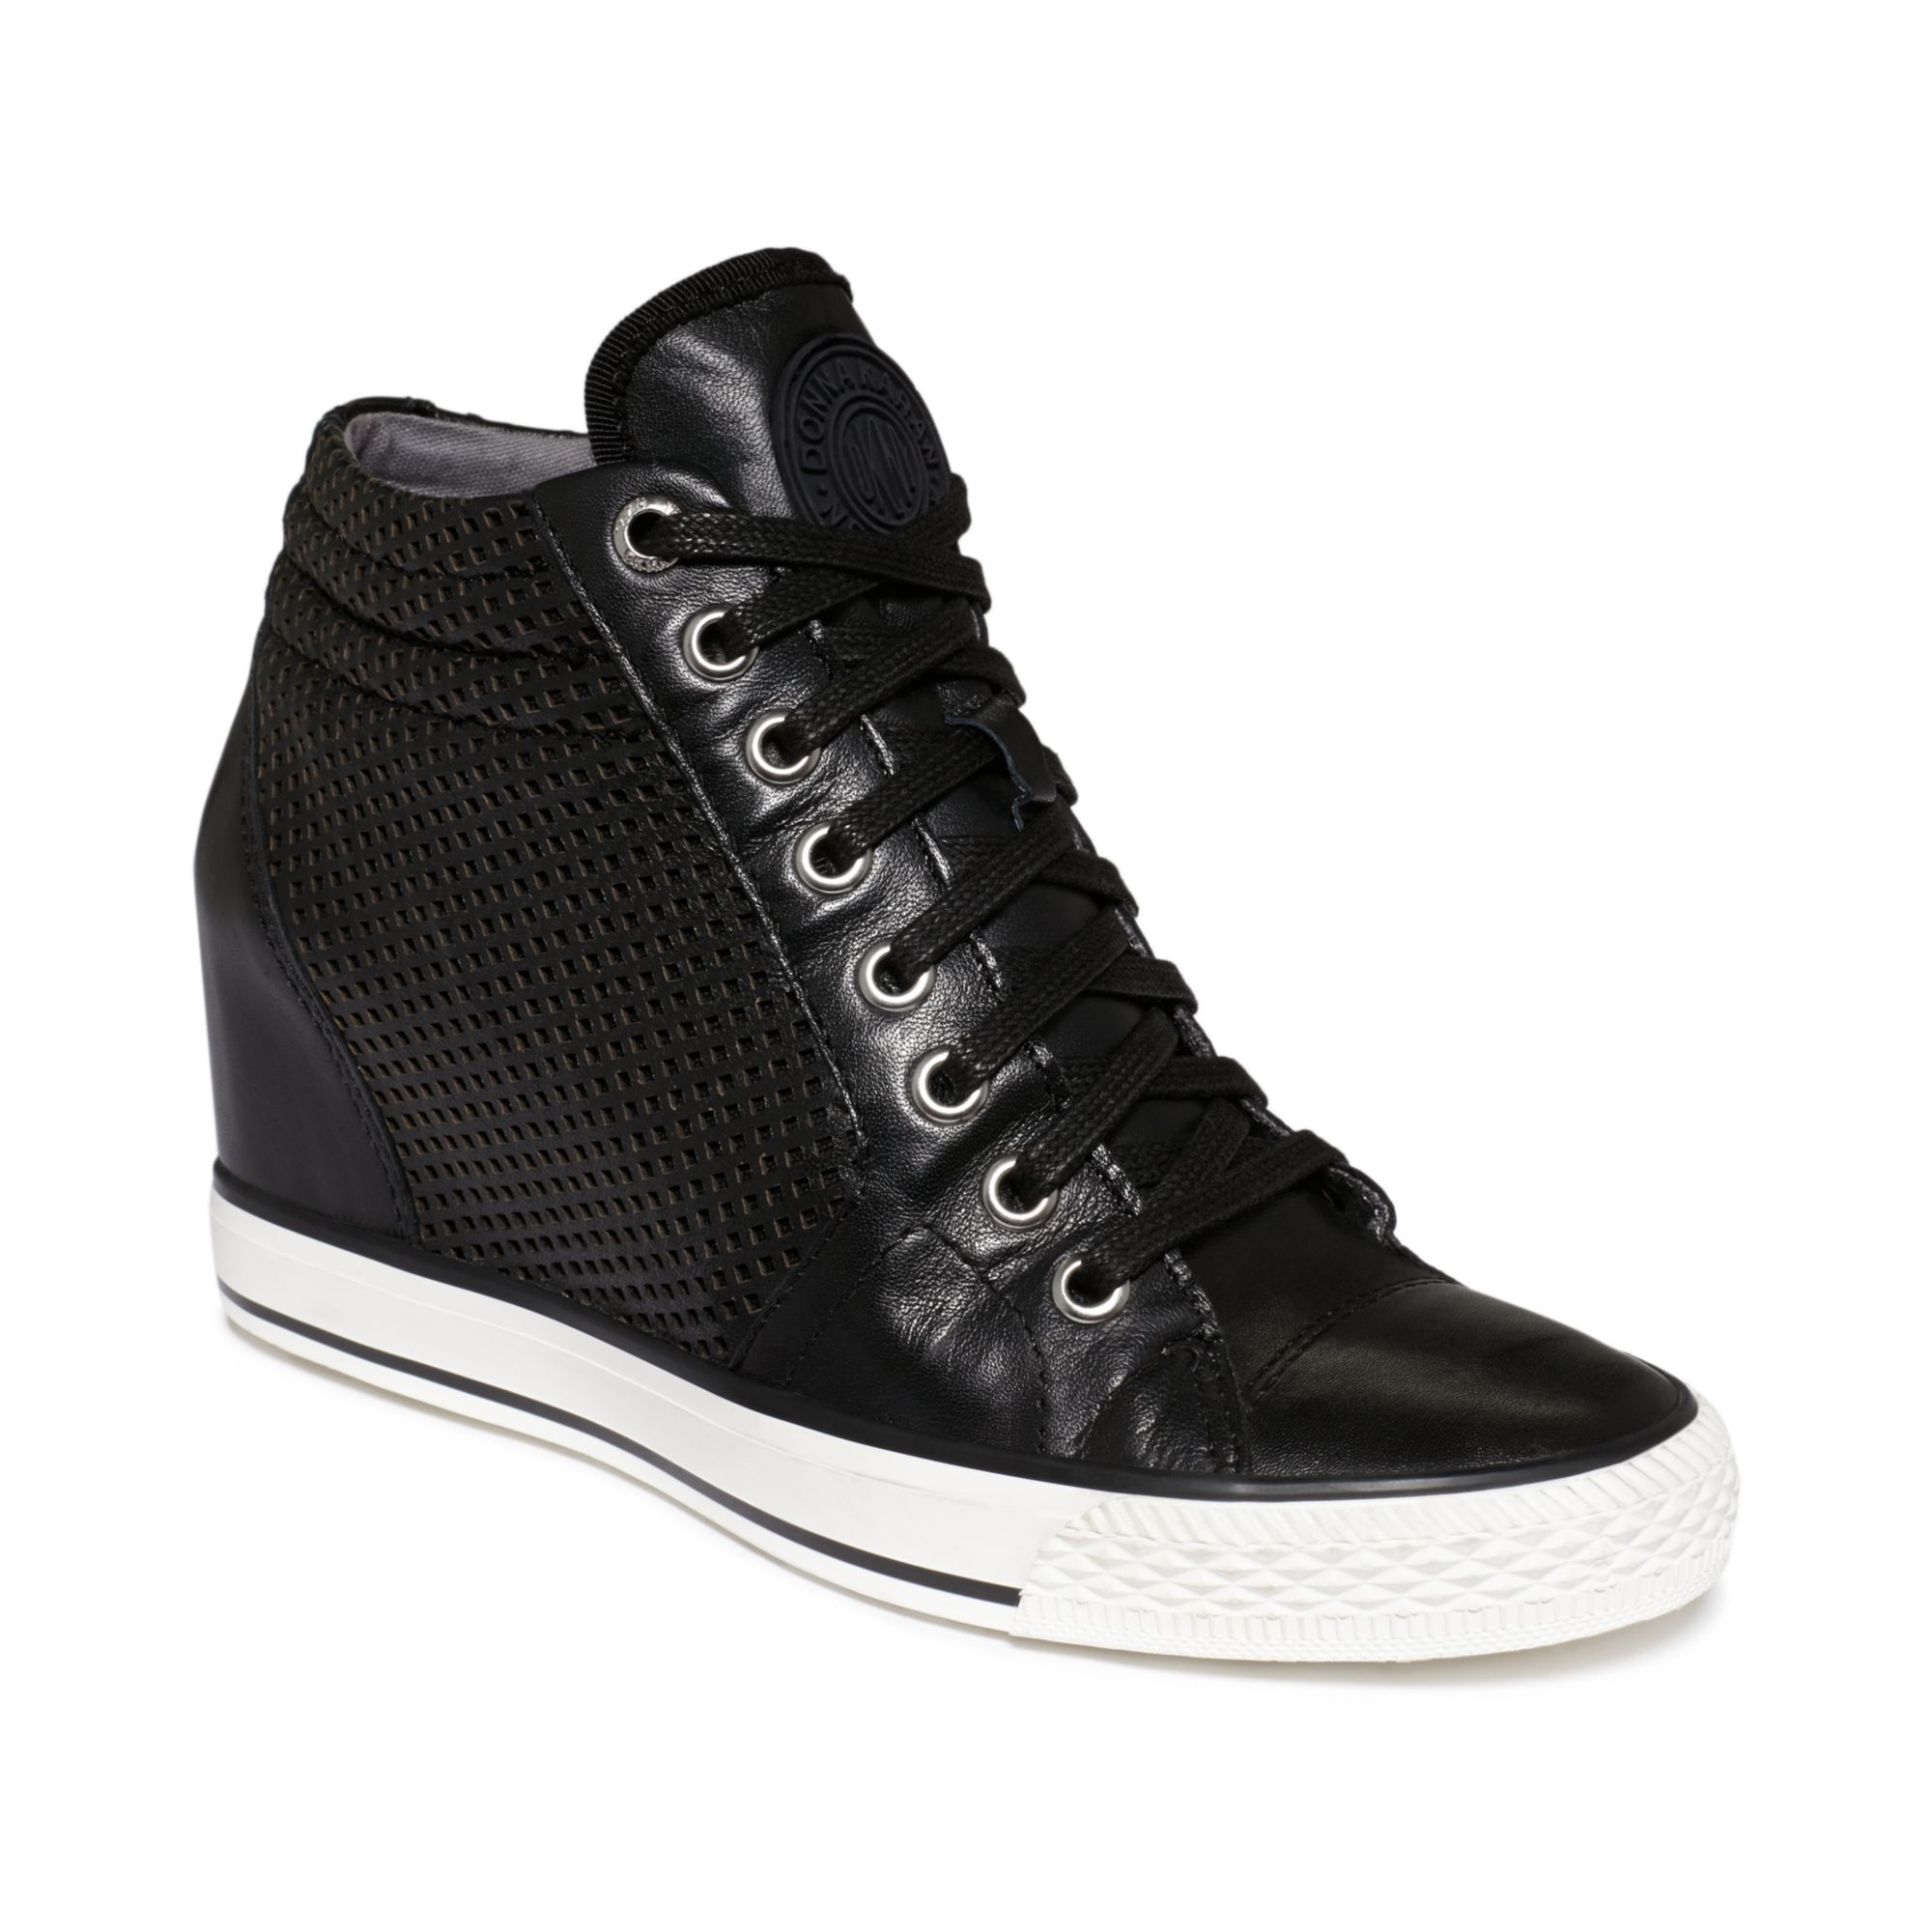 Dkny Womens Cindy Sneakers In Black Black Perf Leather